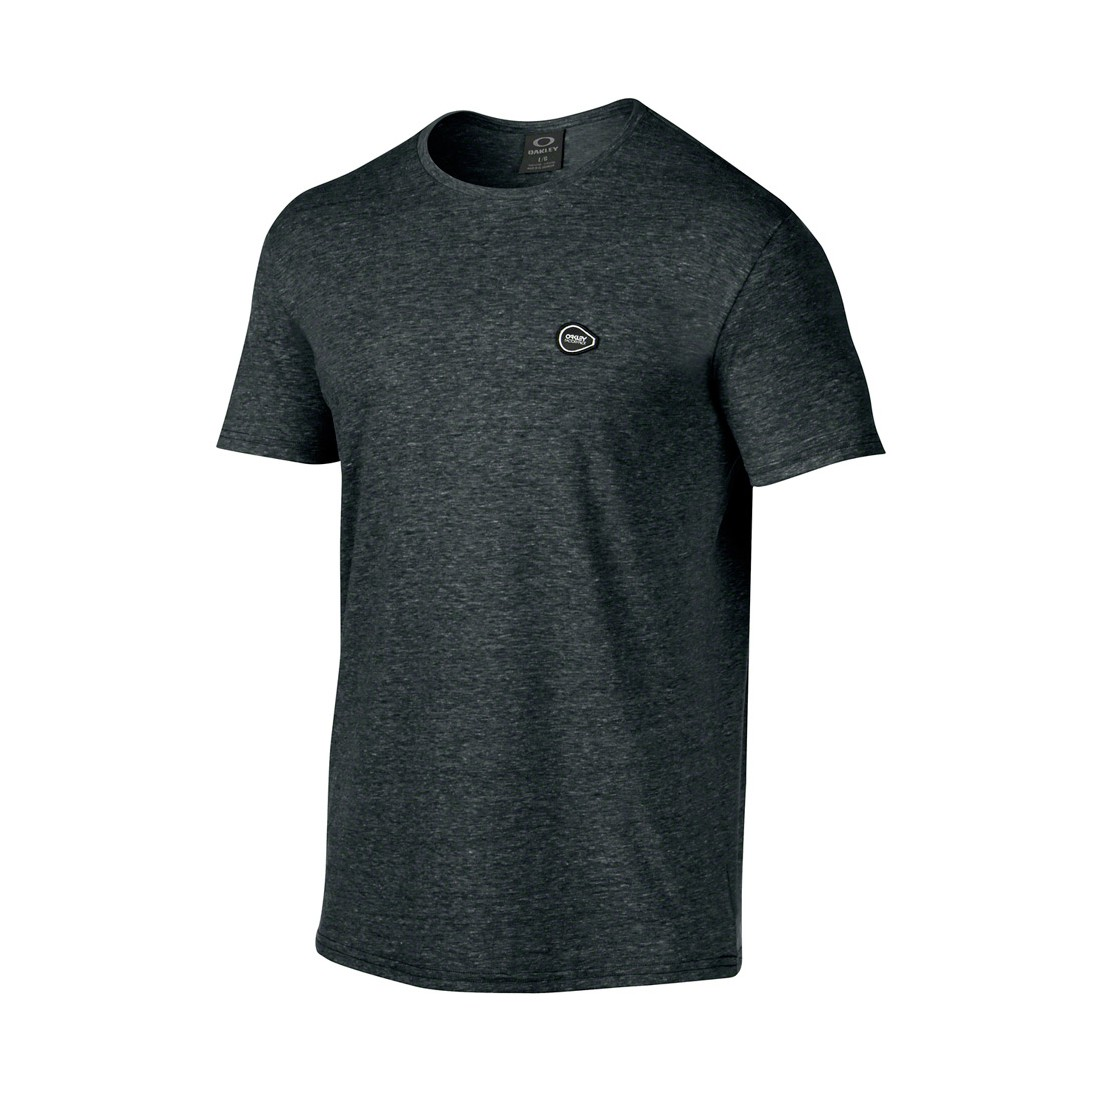 d2532b0417 Oakley T Shirt Malaysia « Heritage Malta